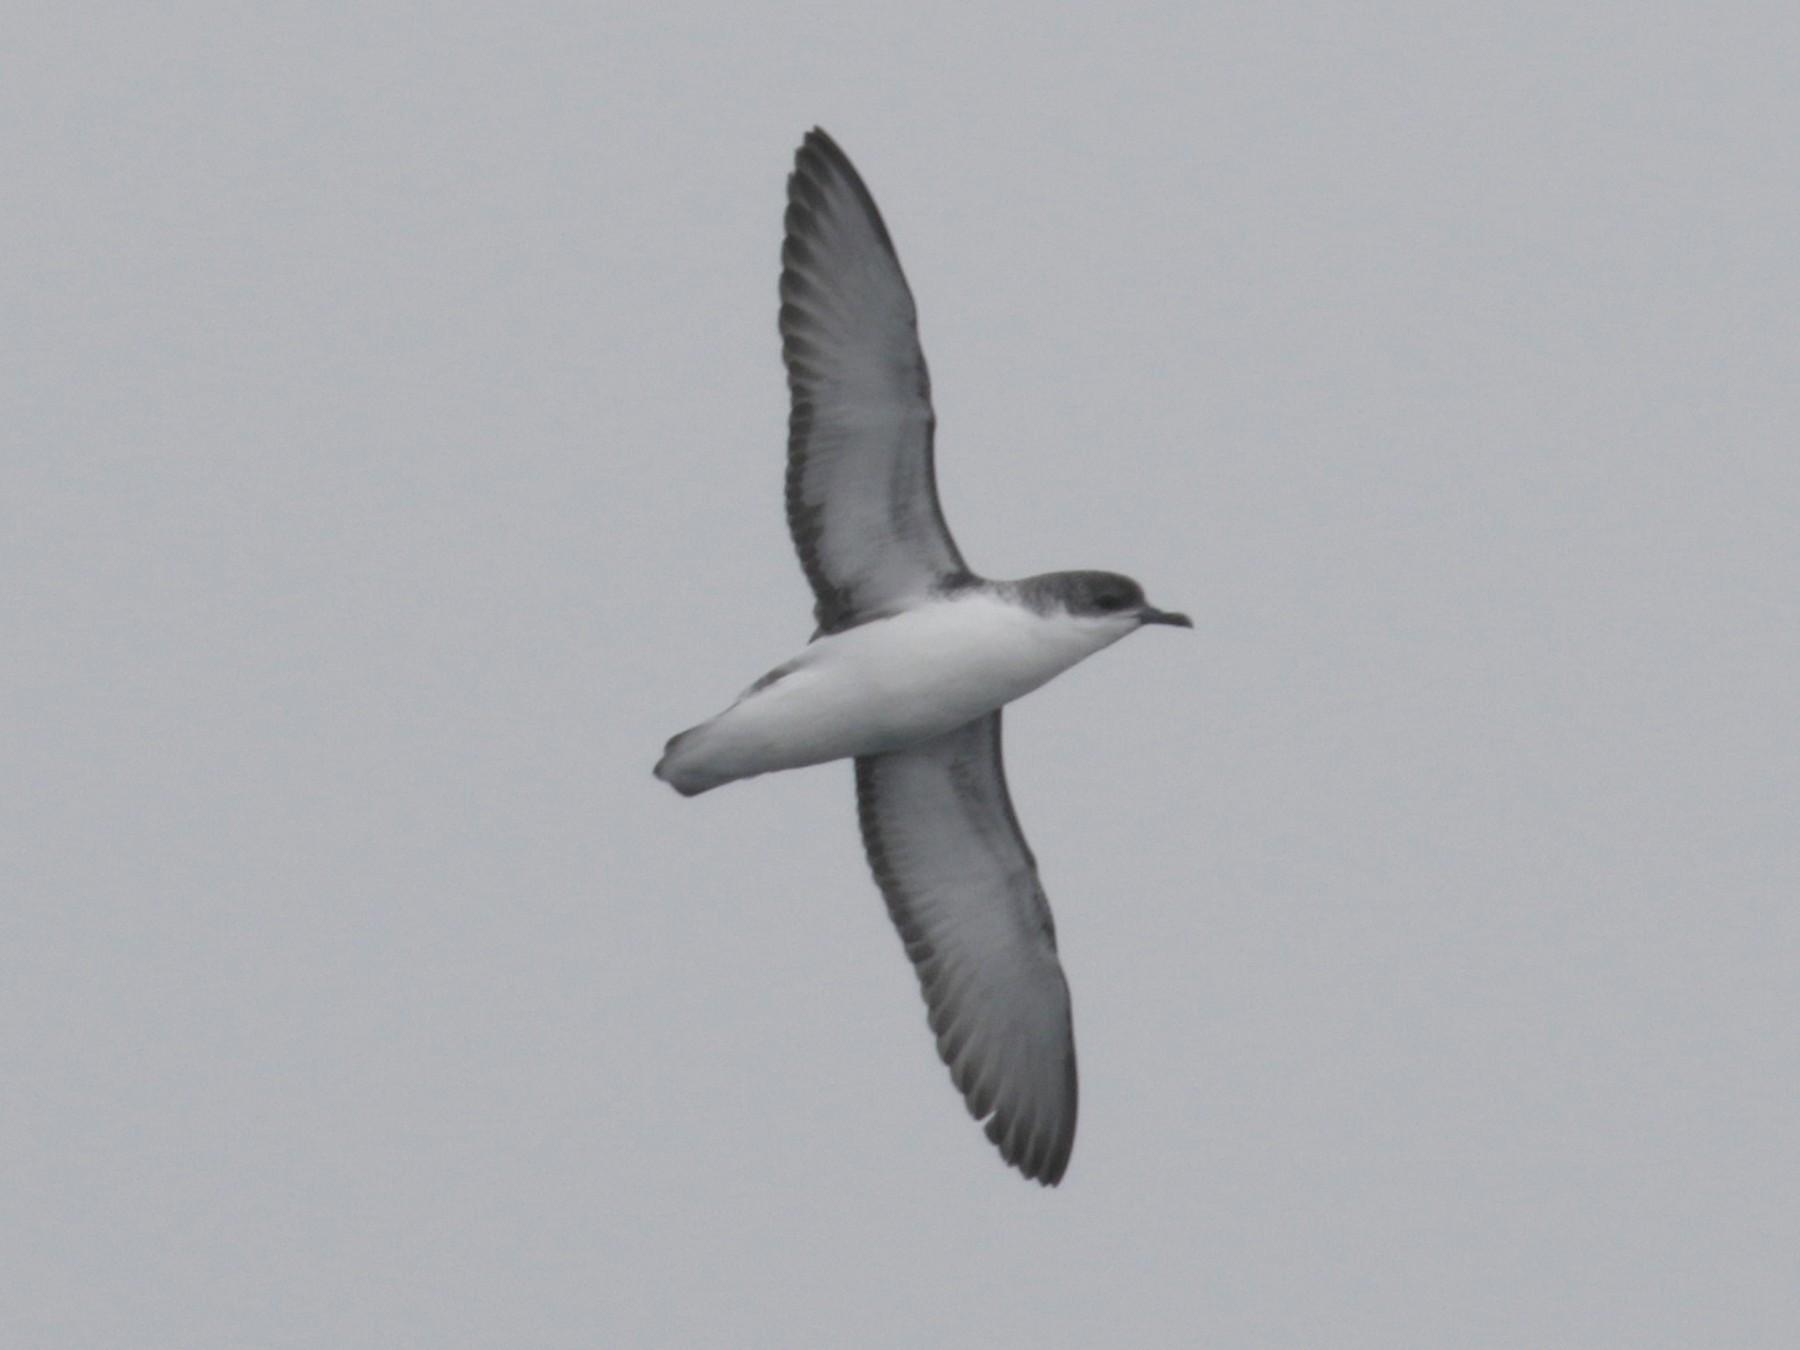 Subantarctic Shearwater - Cameron Eckert